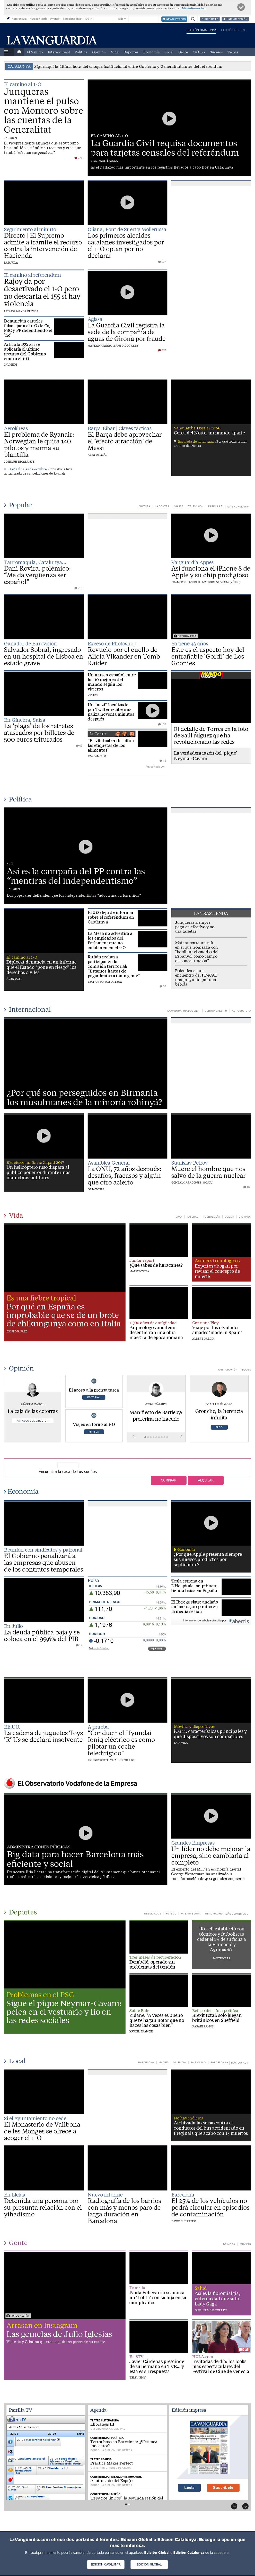 La Vanguardia at Tuesday Sept. 19, 2017, 2:32 p.m. UTC